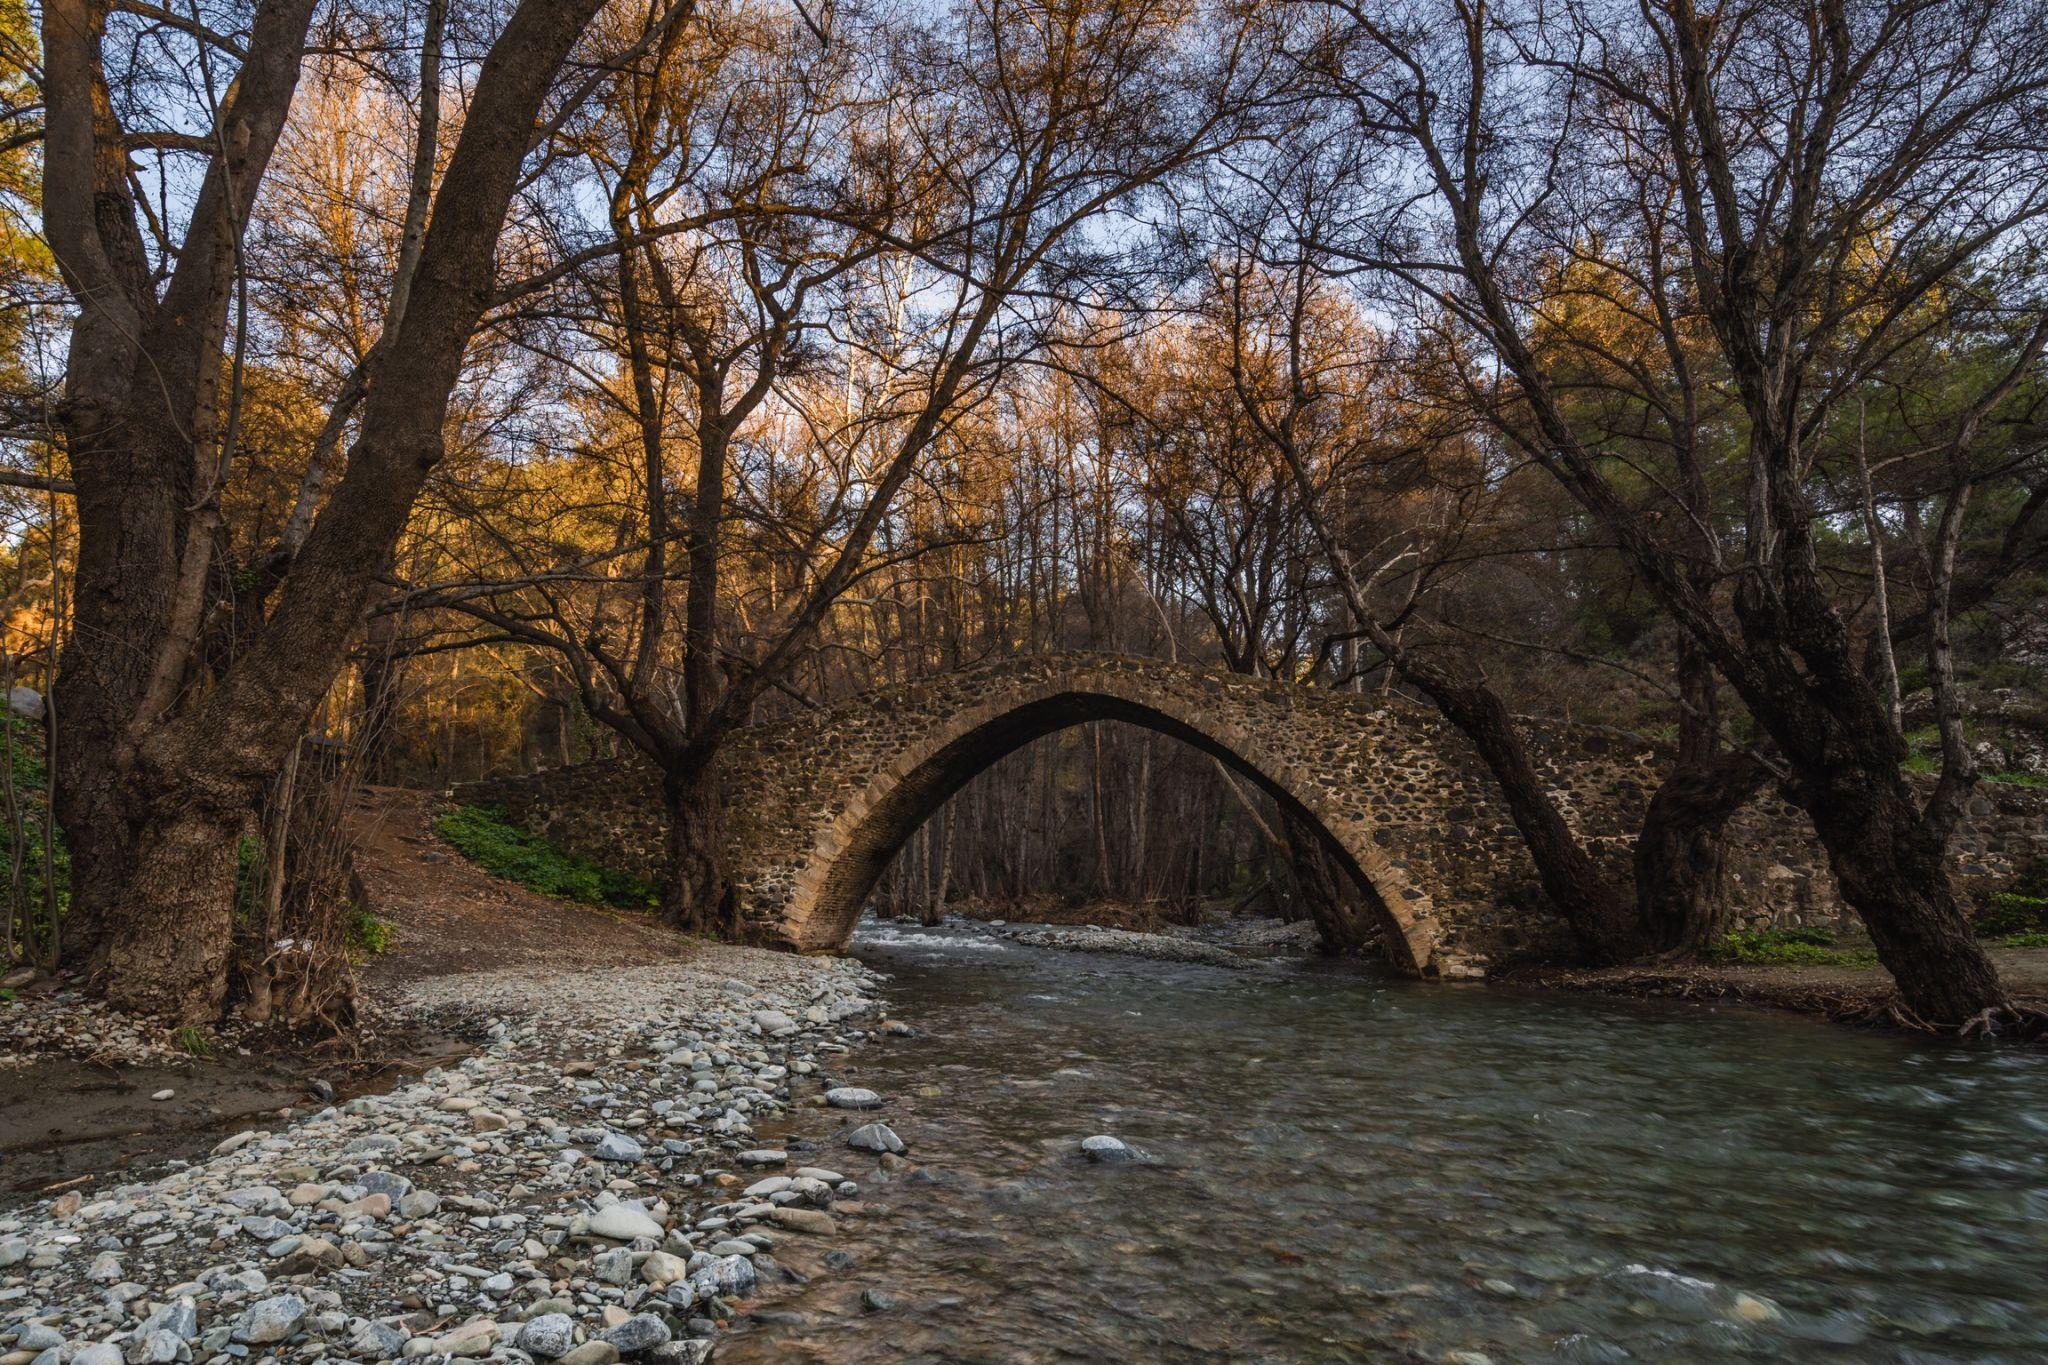 Tzelefos bridge, Cyprus